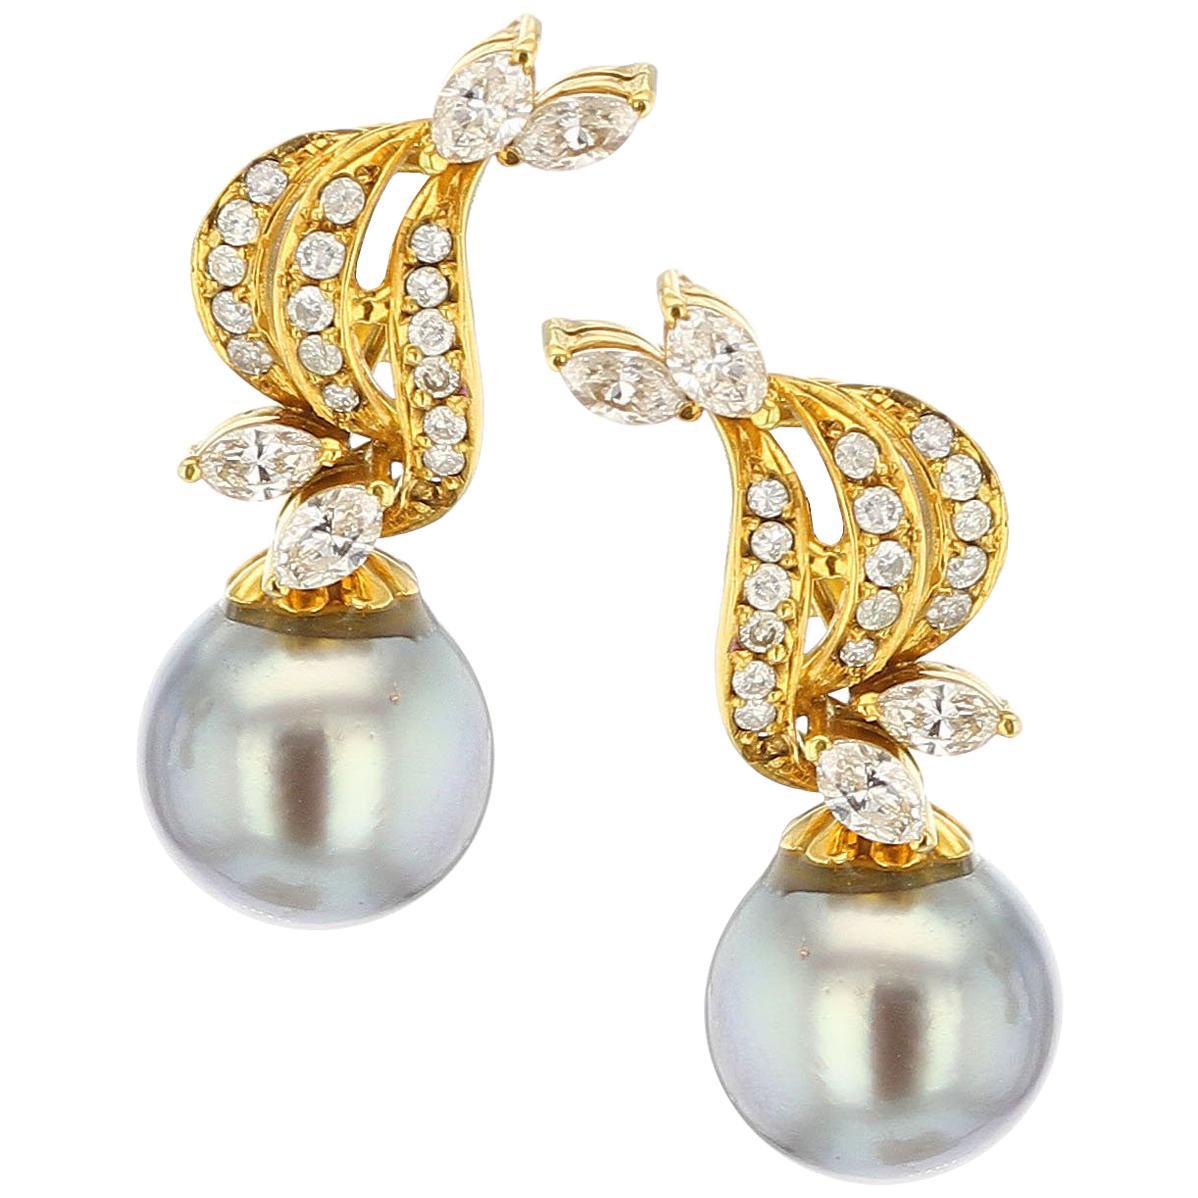 Gray Tahitian Cultured Pearl Diamond Drop Earrings, Detachable, 14K Yellow Gold